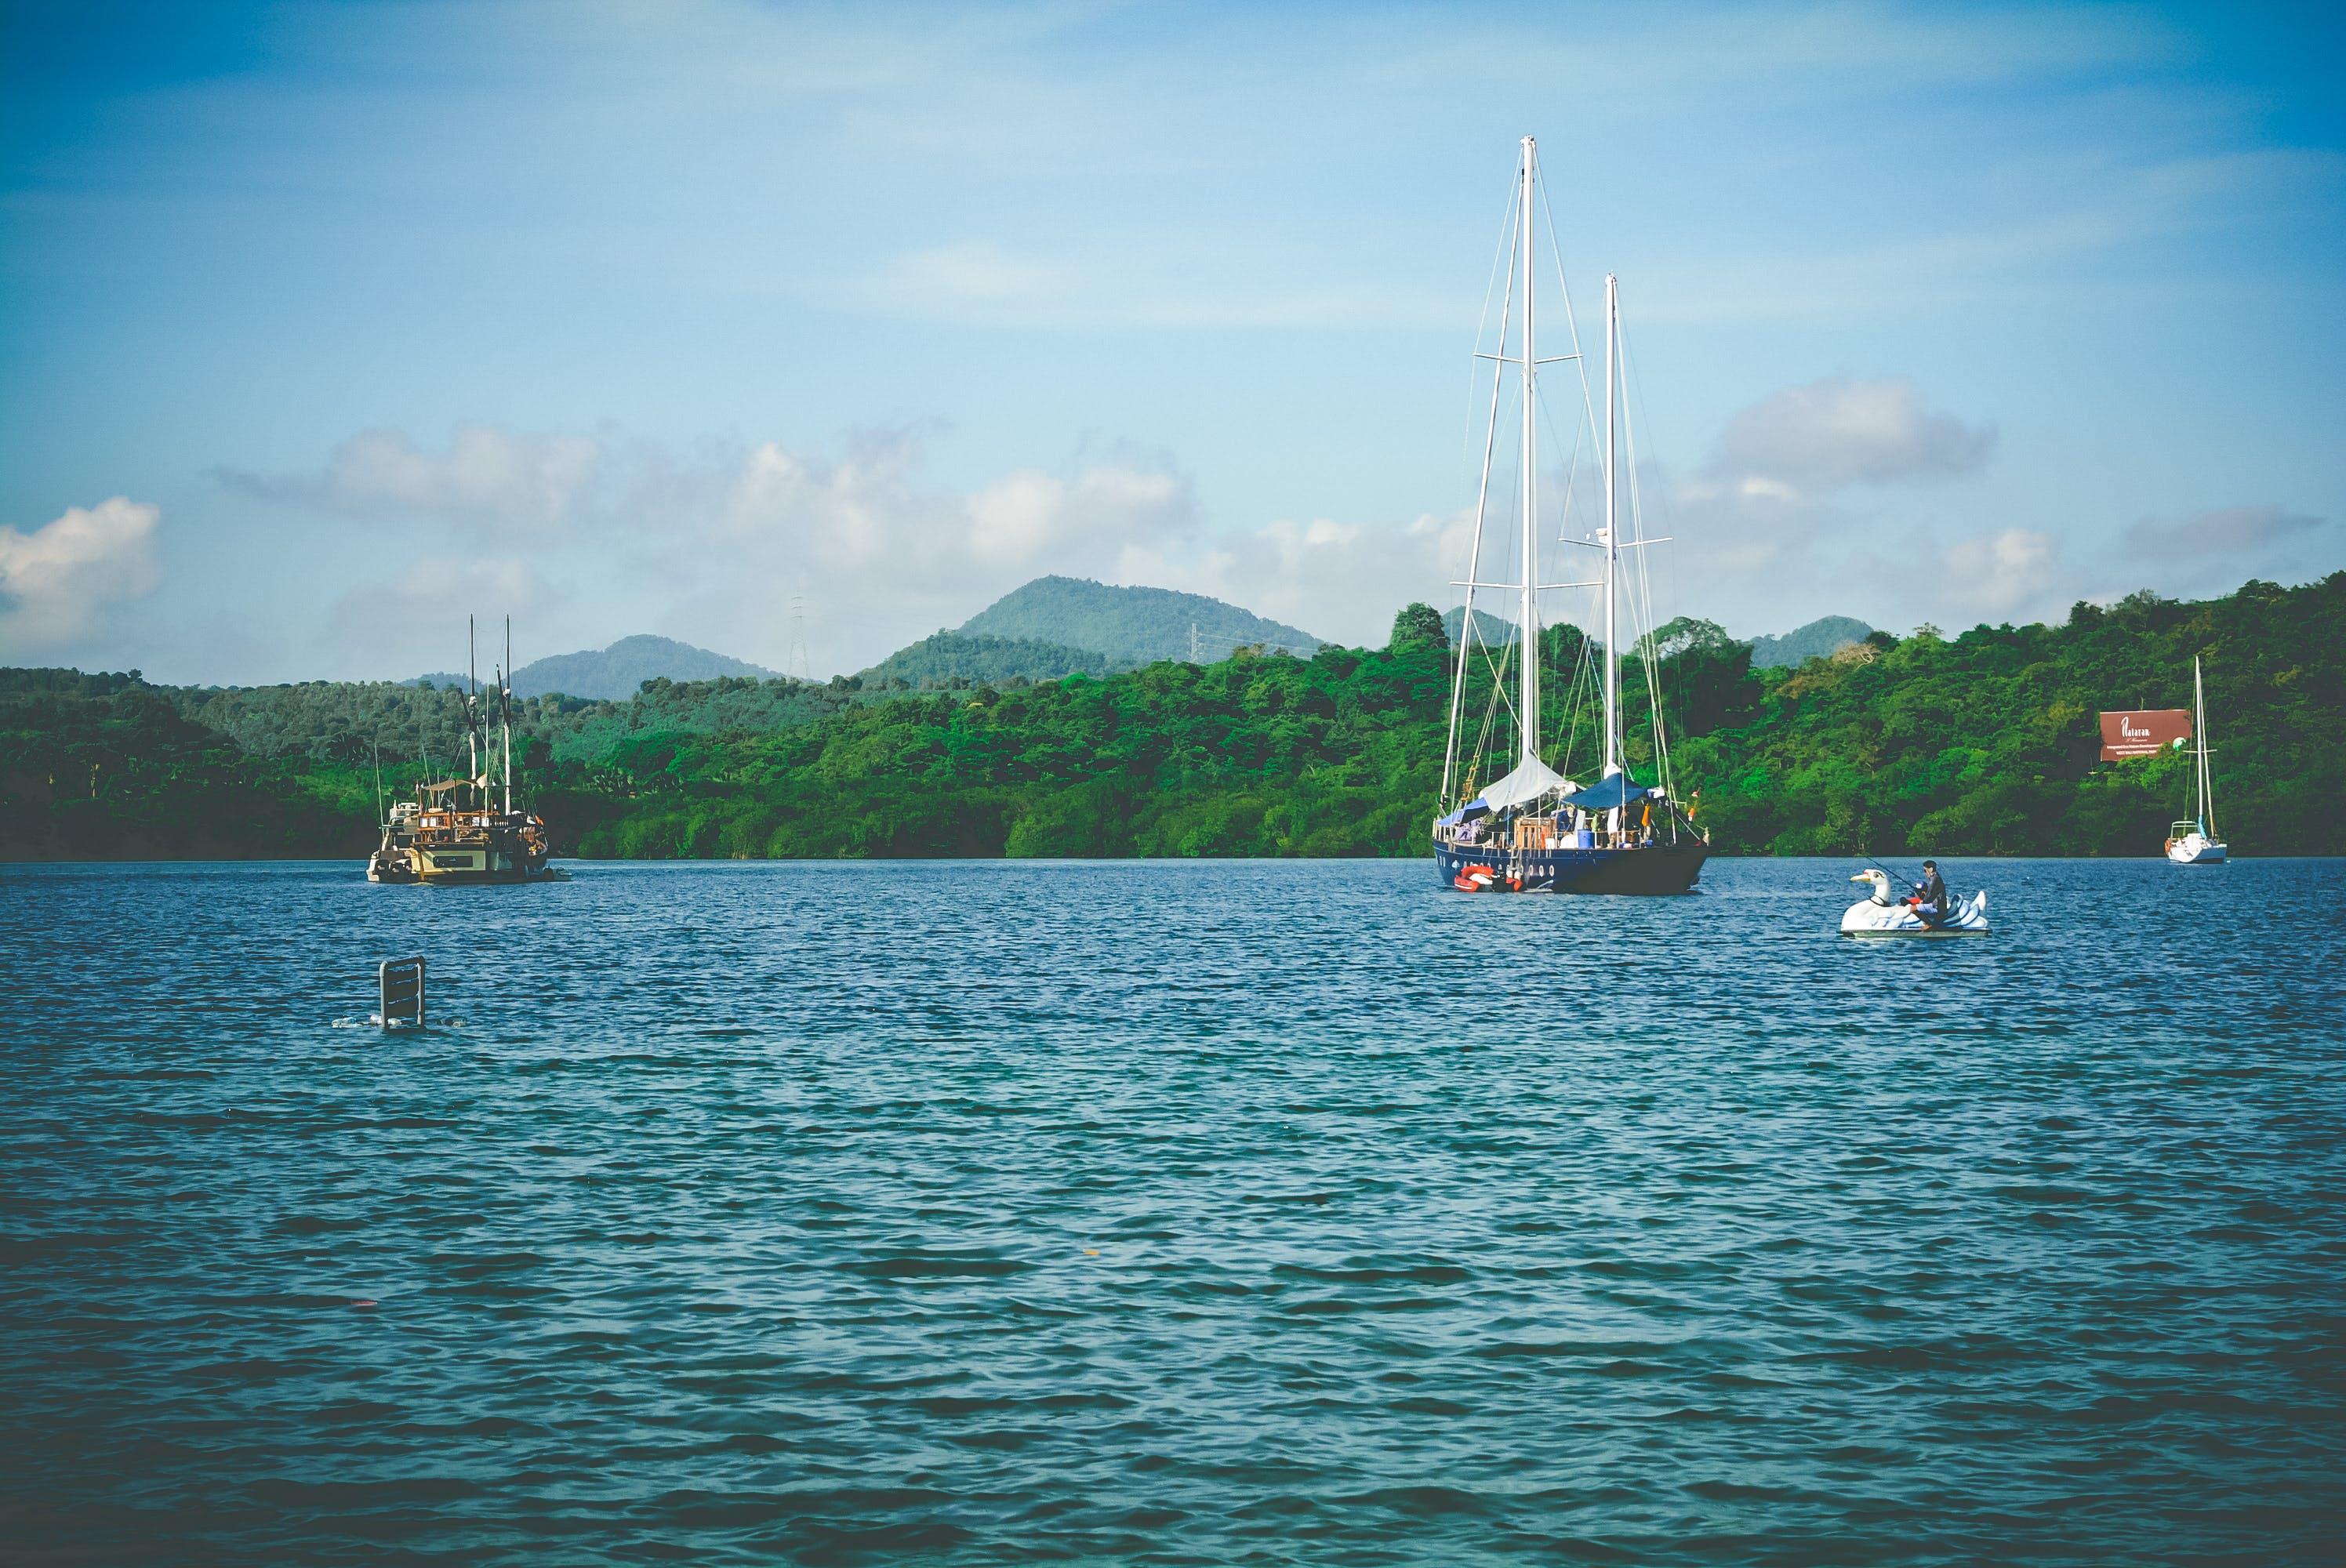 beach, boat, calm waters